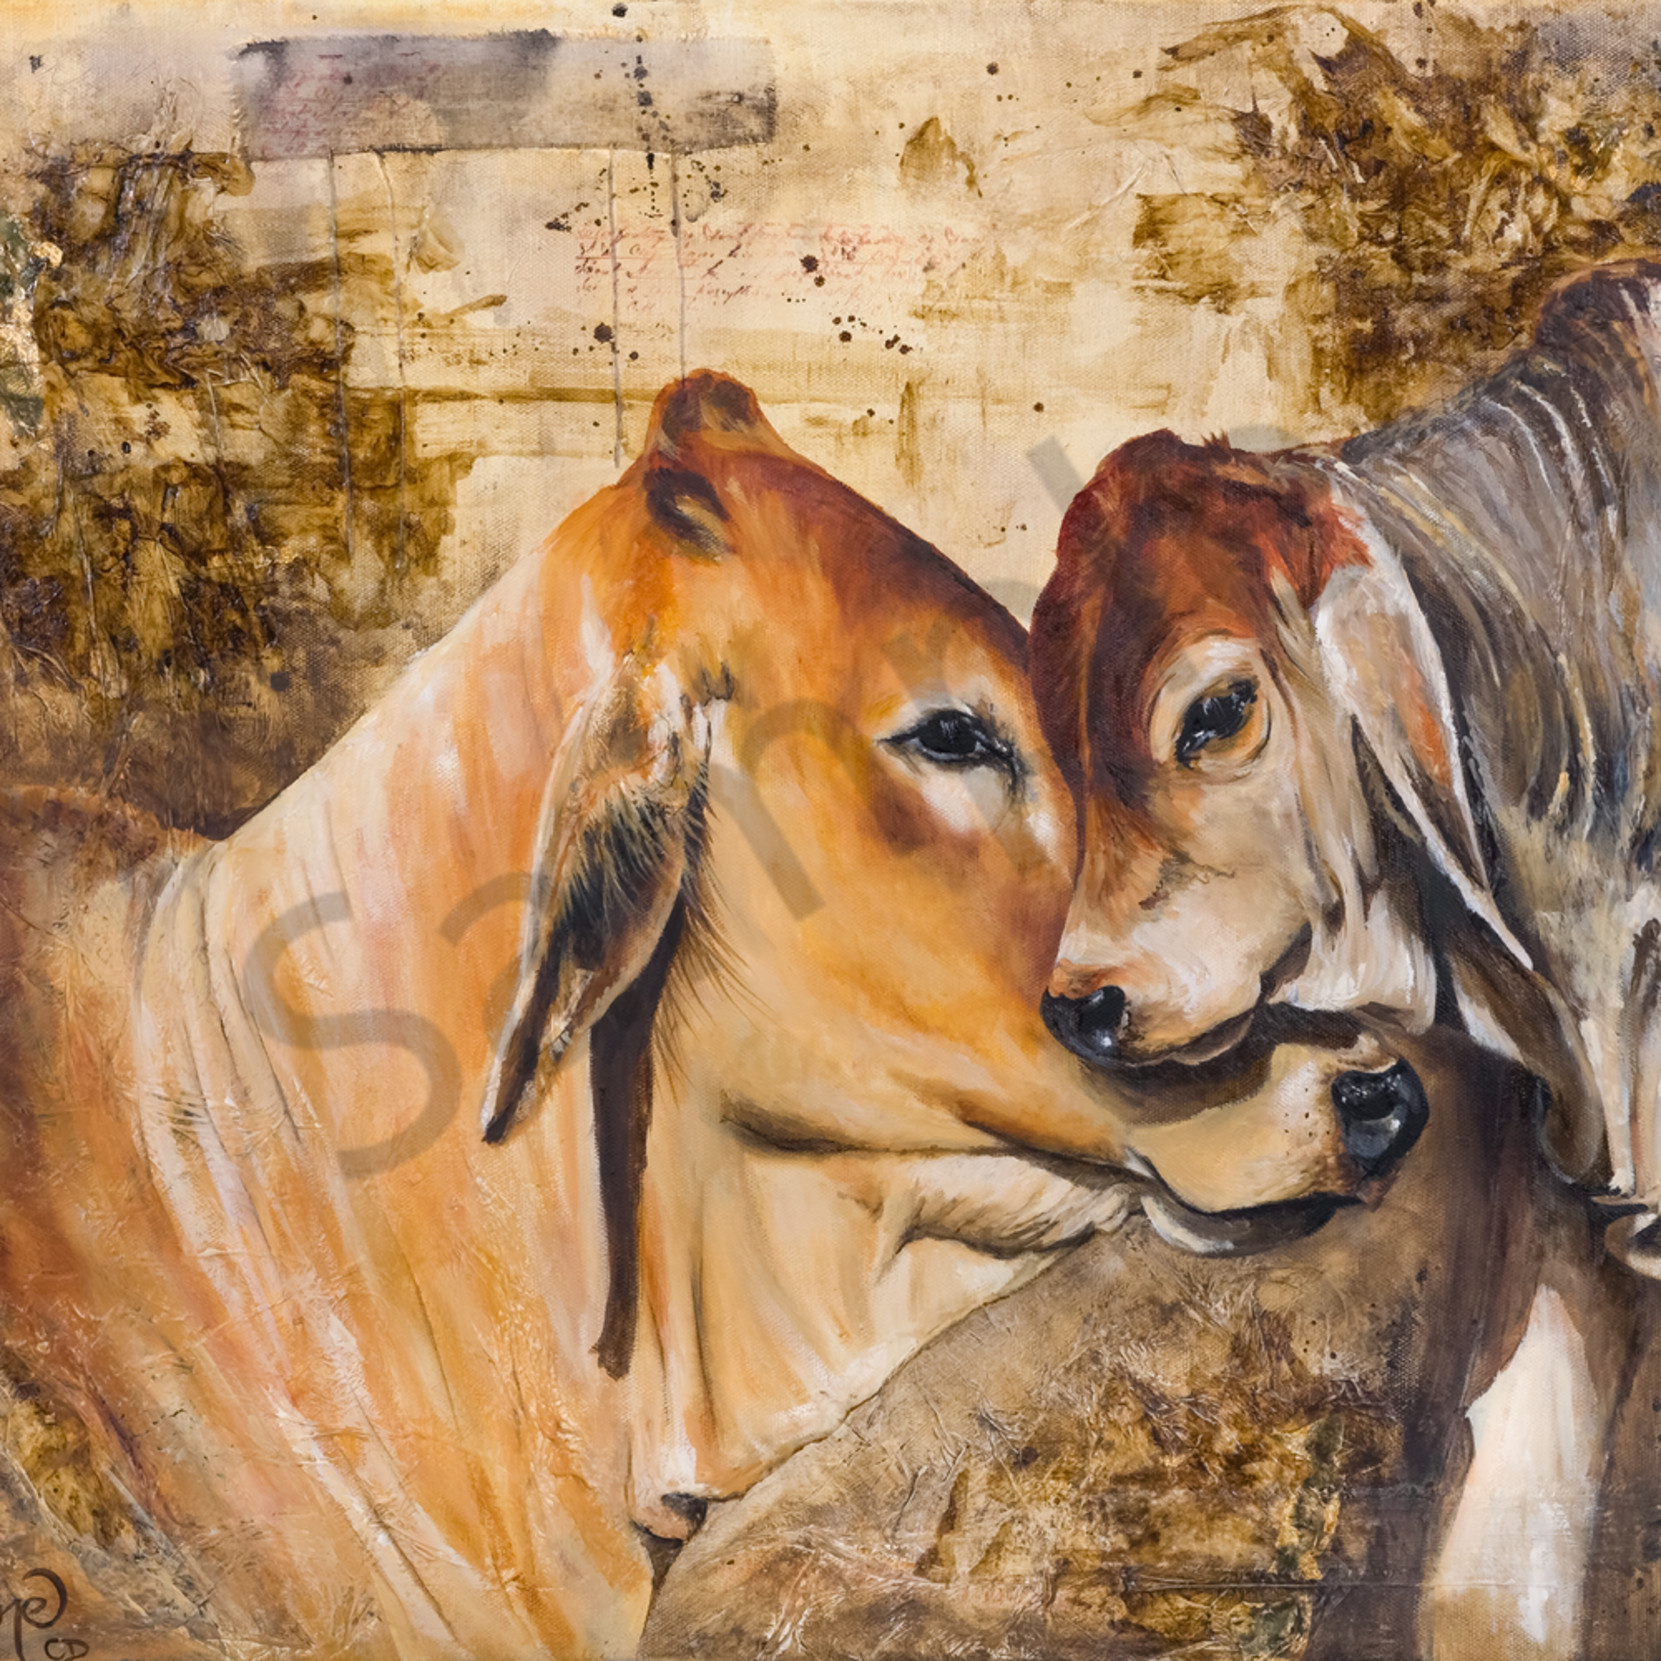 C clark dowden 001 cow and calf lgaq6s